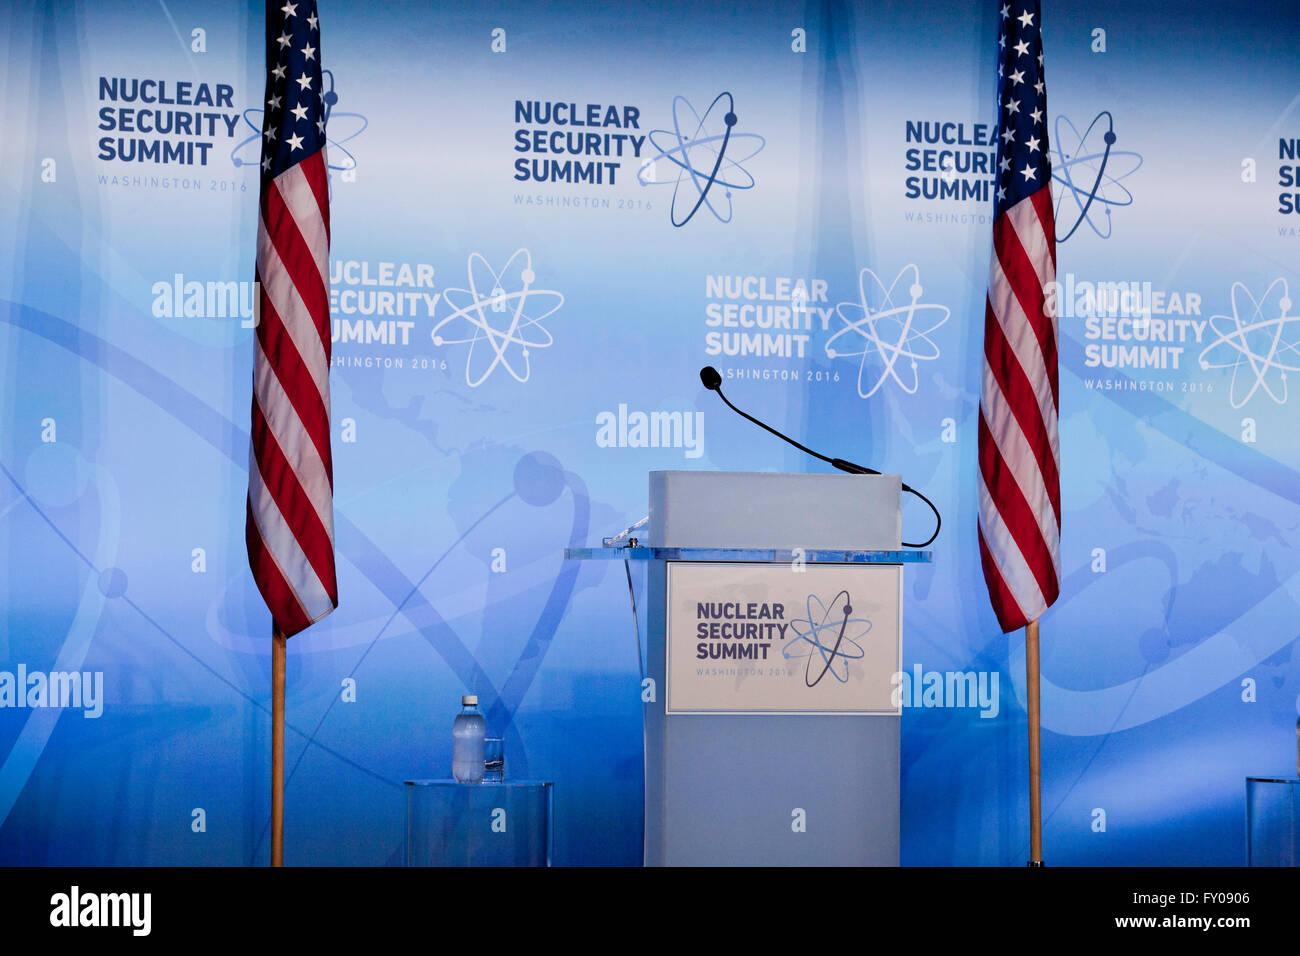 2016 Nuclear Security Summit speaker's lectern - Washington, DC USA - Stock Image